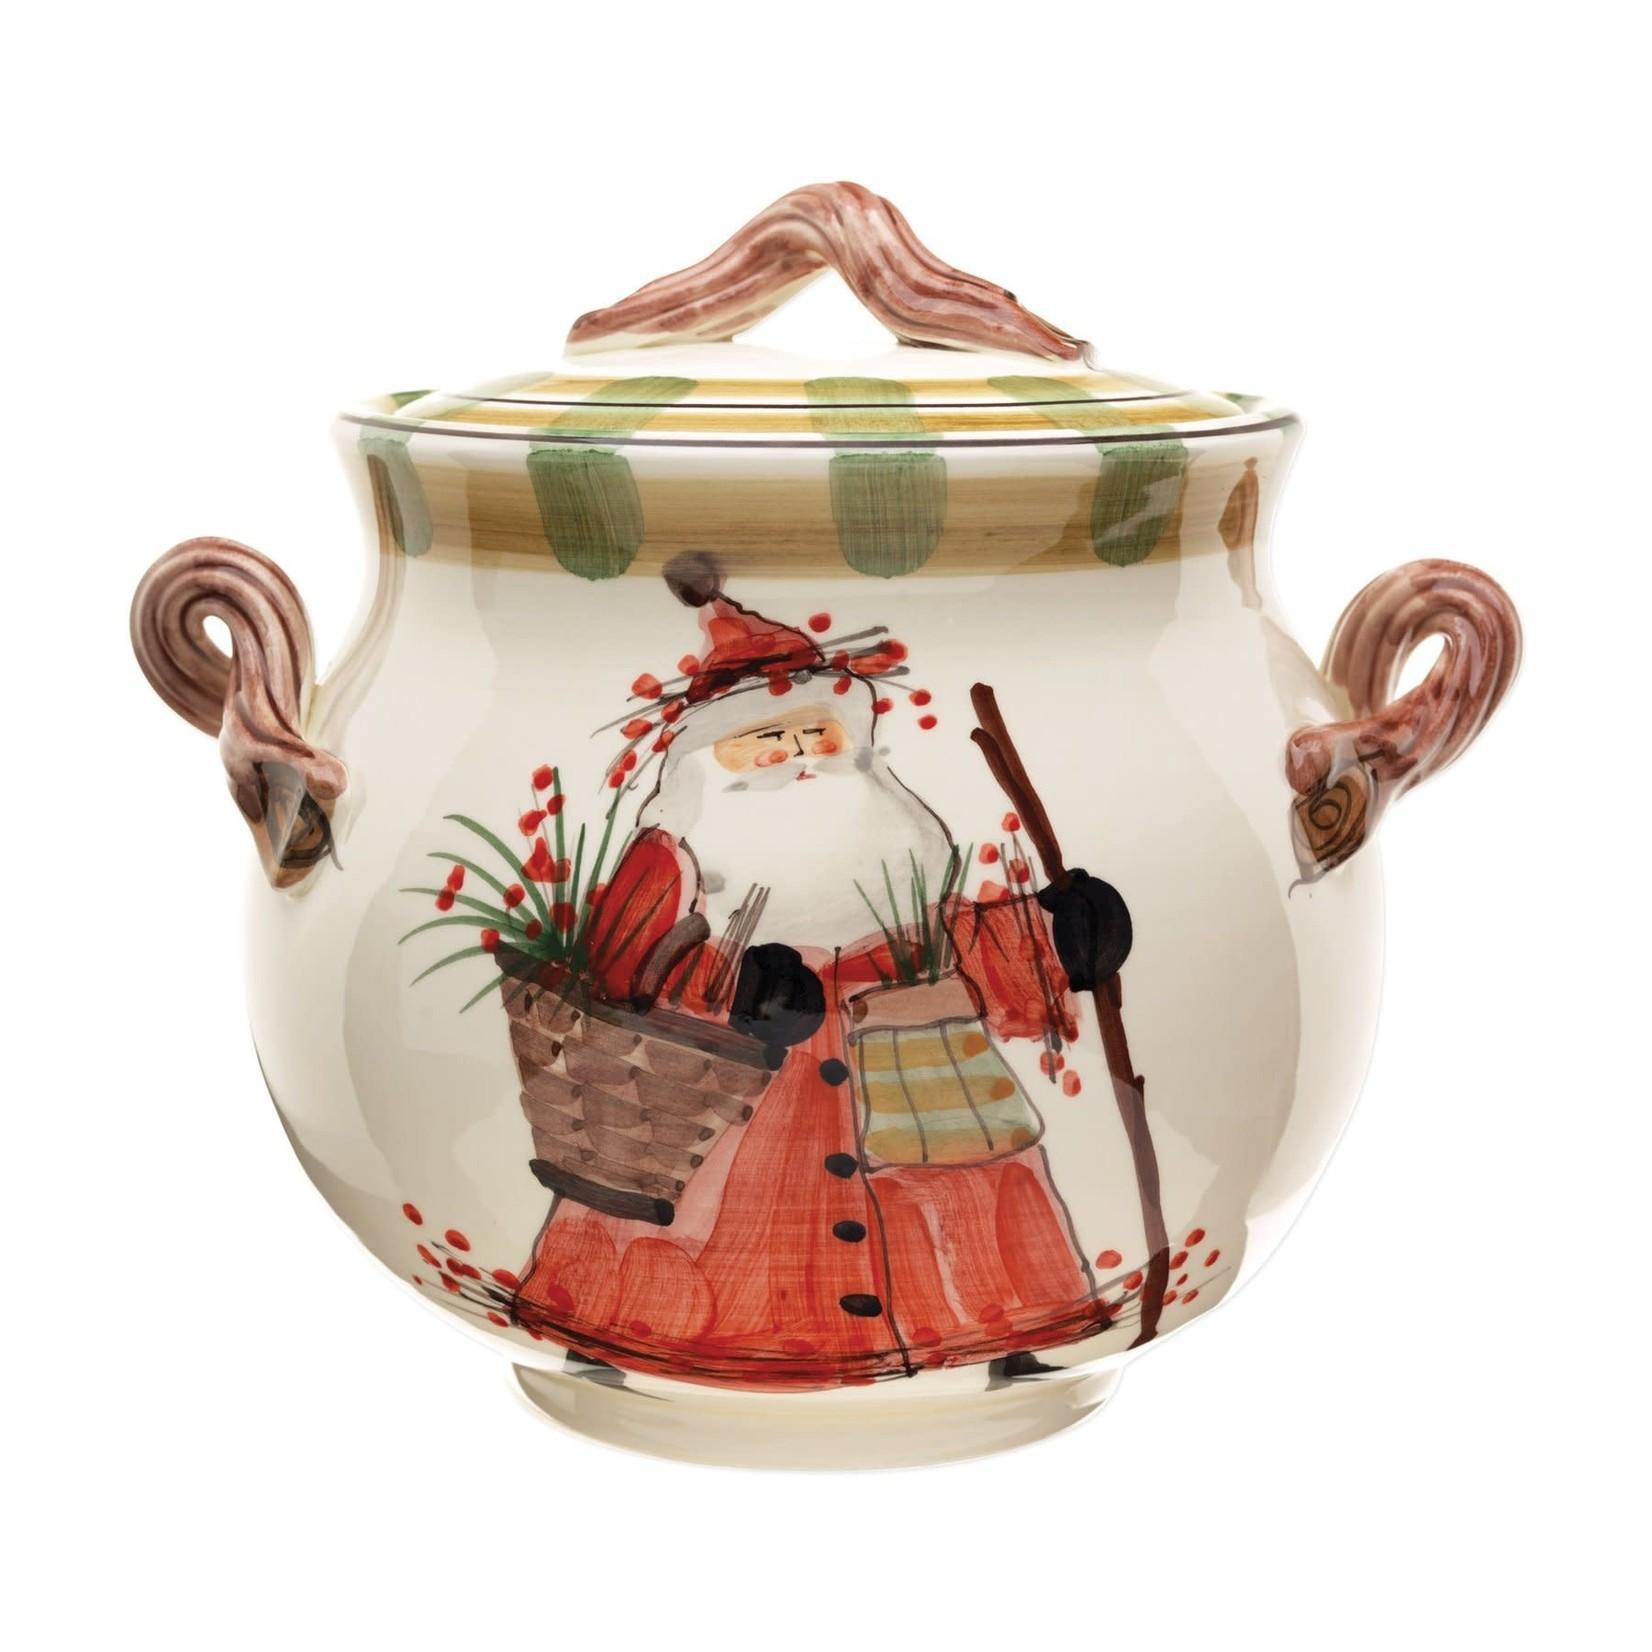 OSN Biscotti Jar